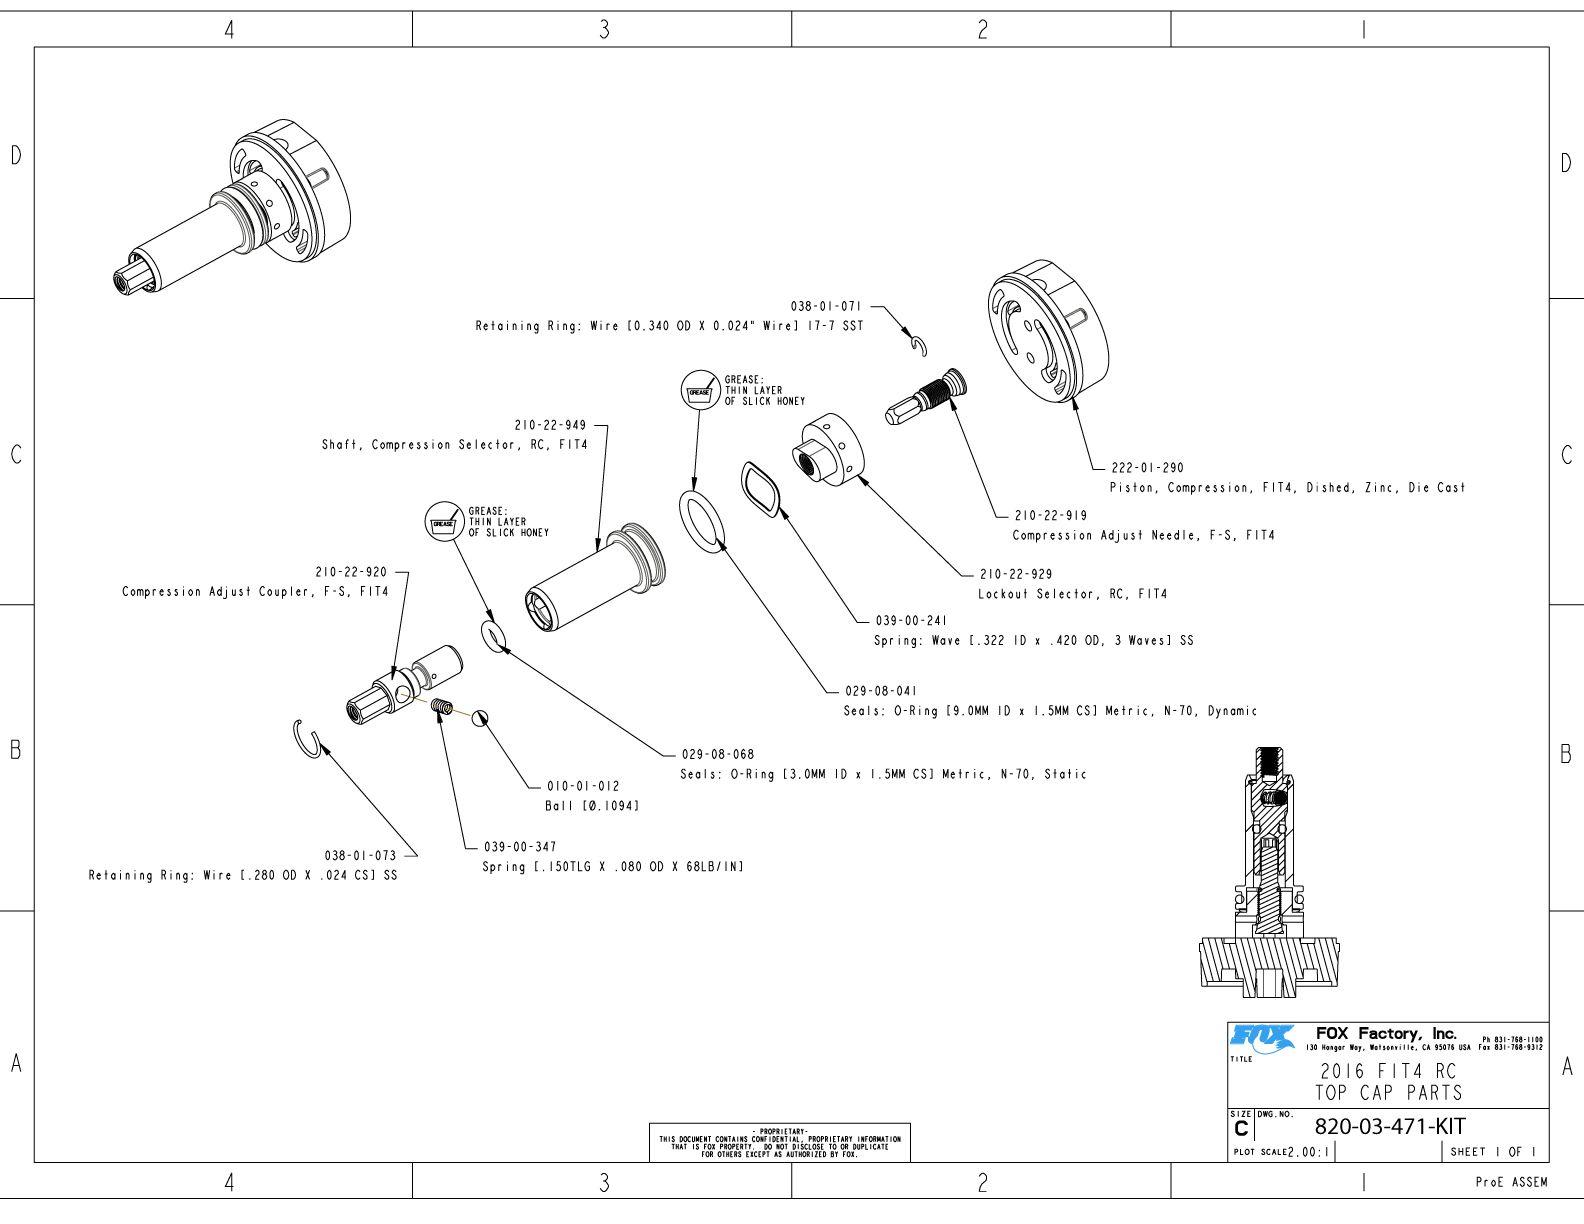 40mm Part Information Bike Help Center Fox 03 Big Dog Wiring Diagram 820 471 Kit 2016 Fit4 Rc Top Cap Parts